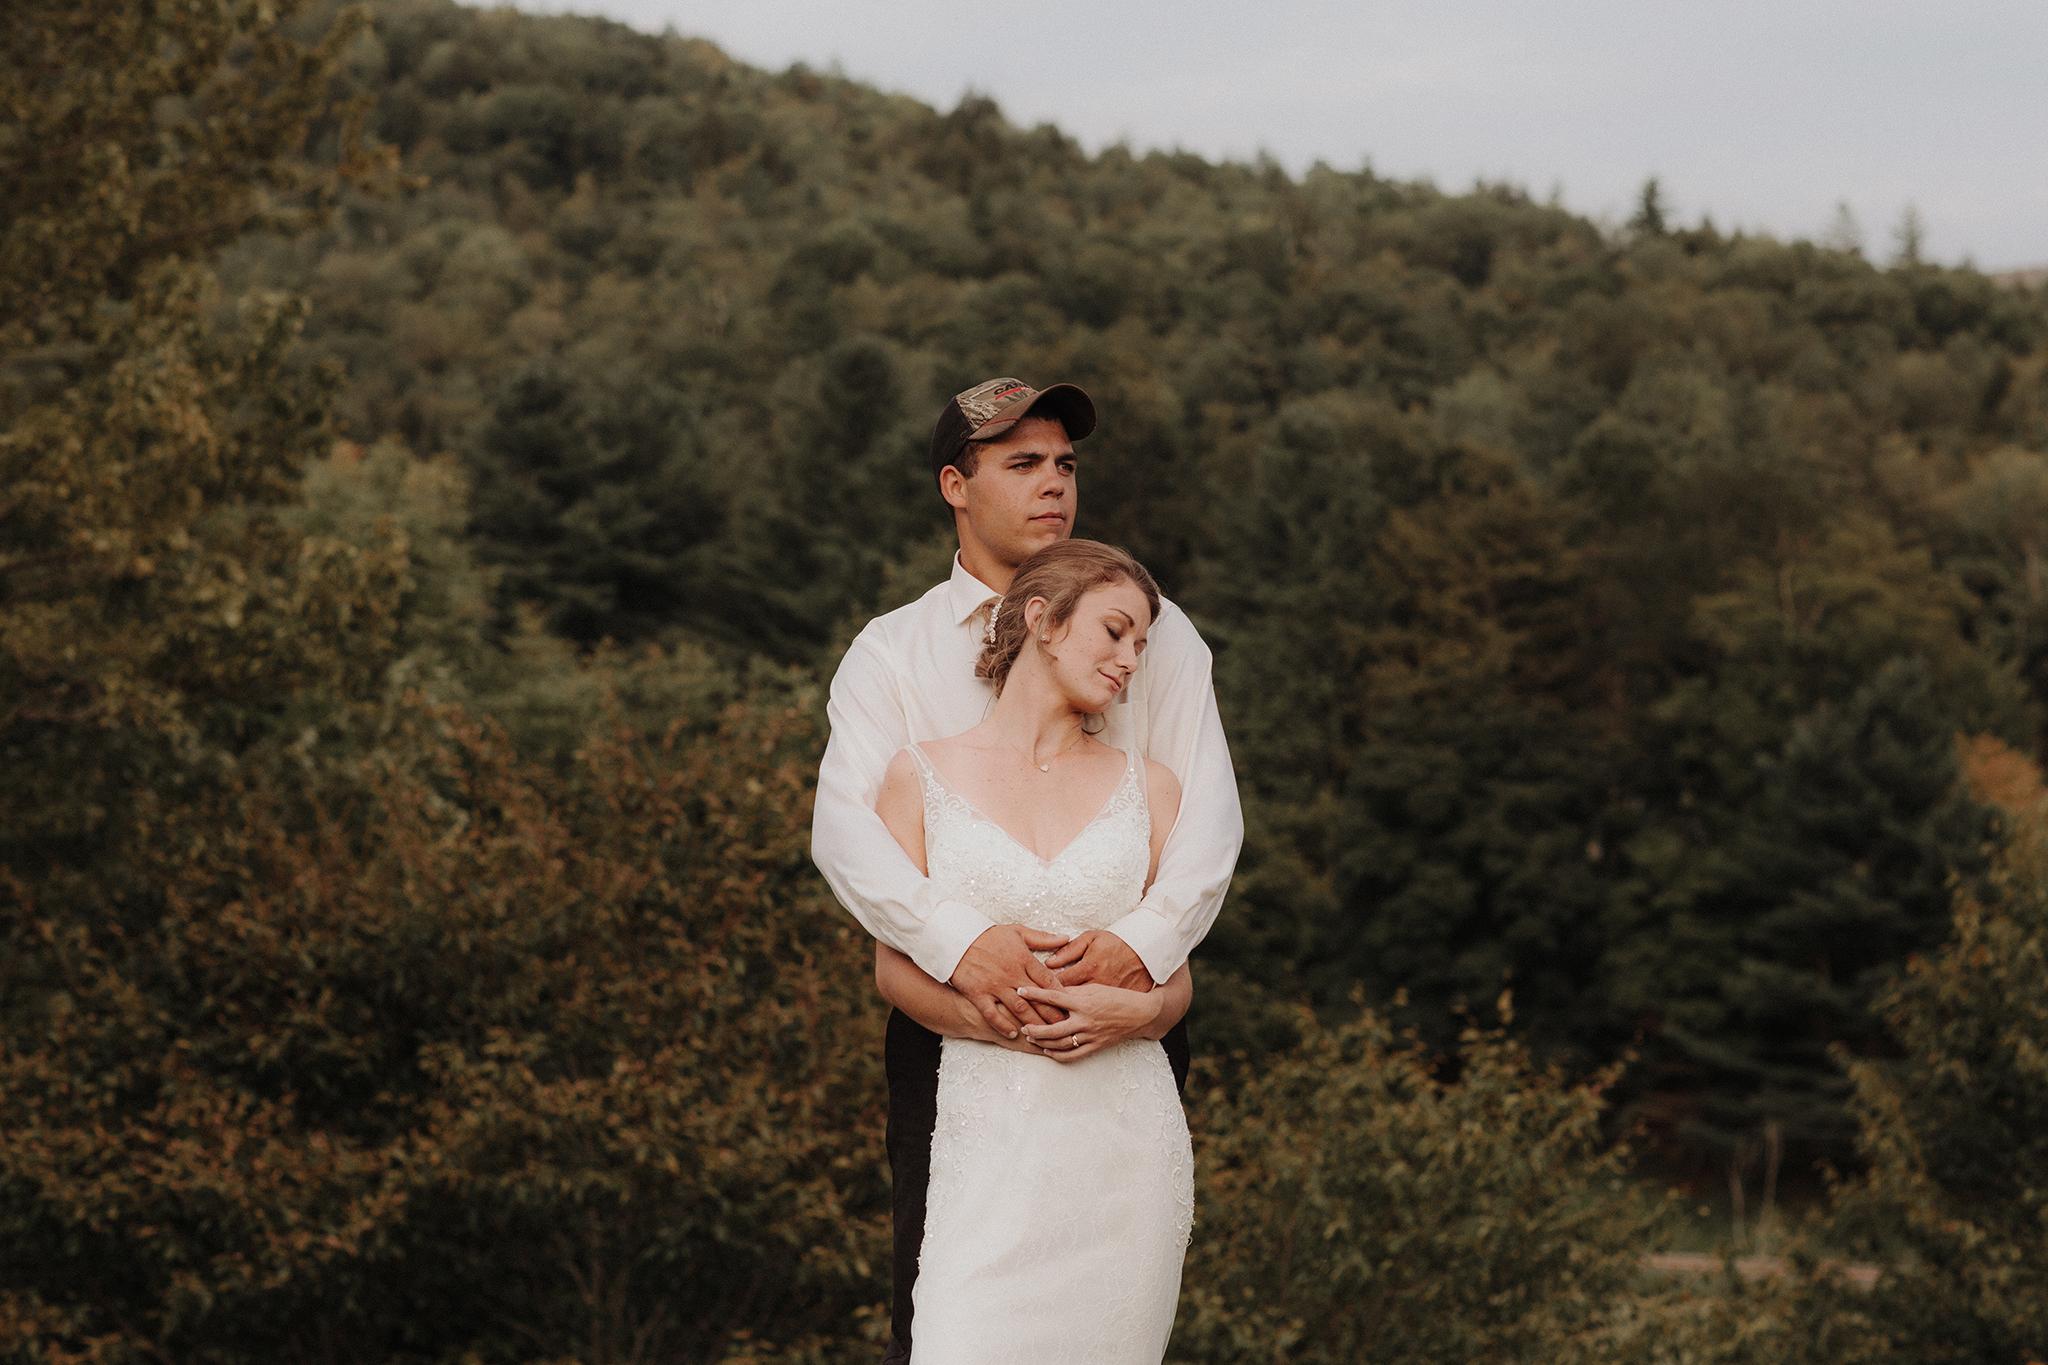 vermont-wedding-photographer-outdoor-farm-wedding-67.jpg